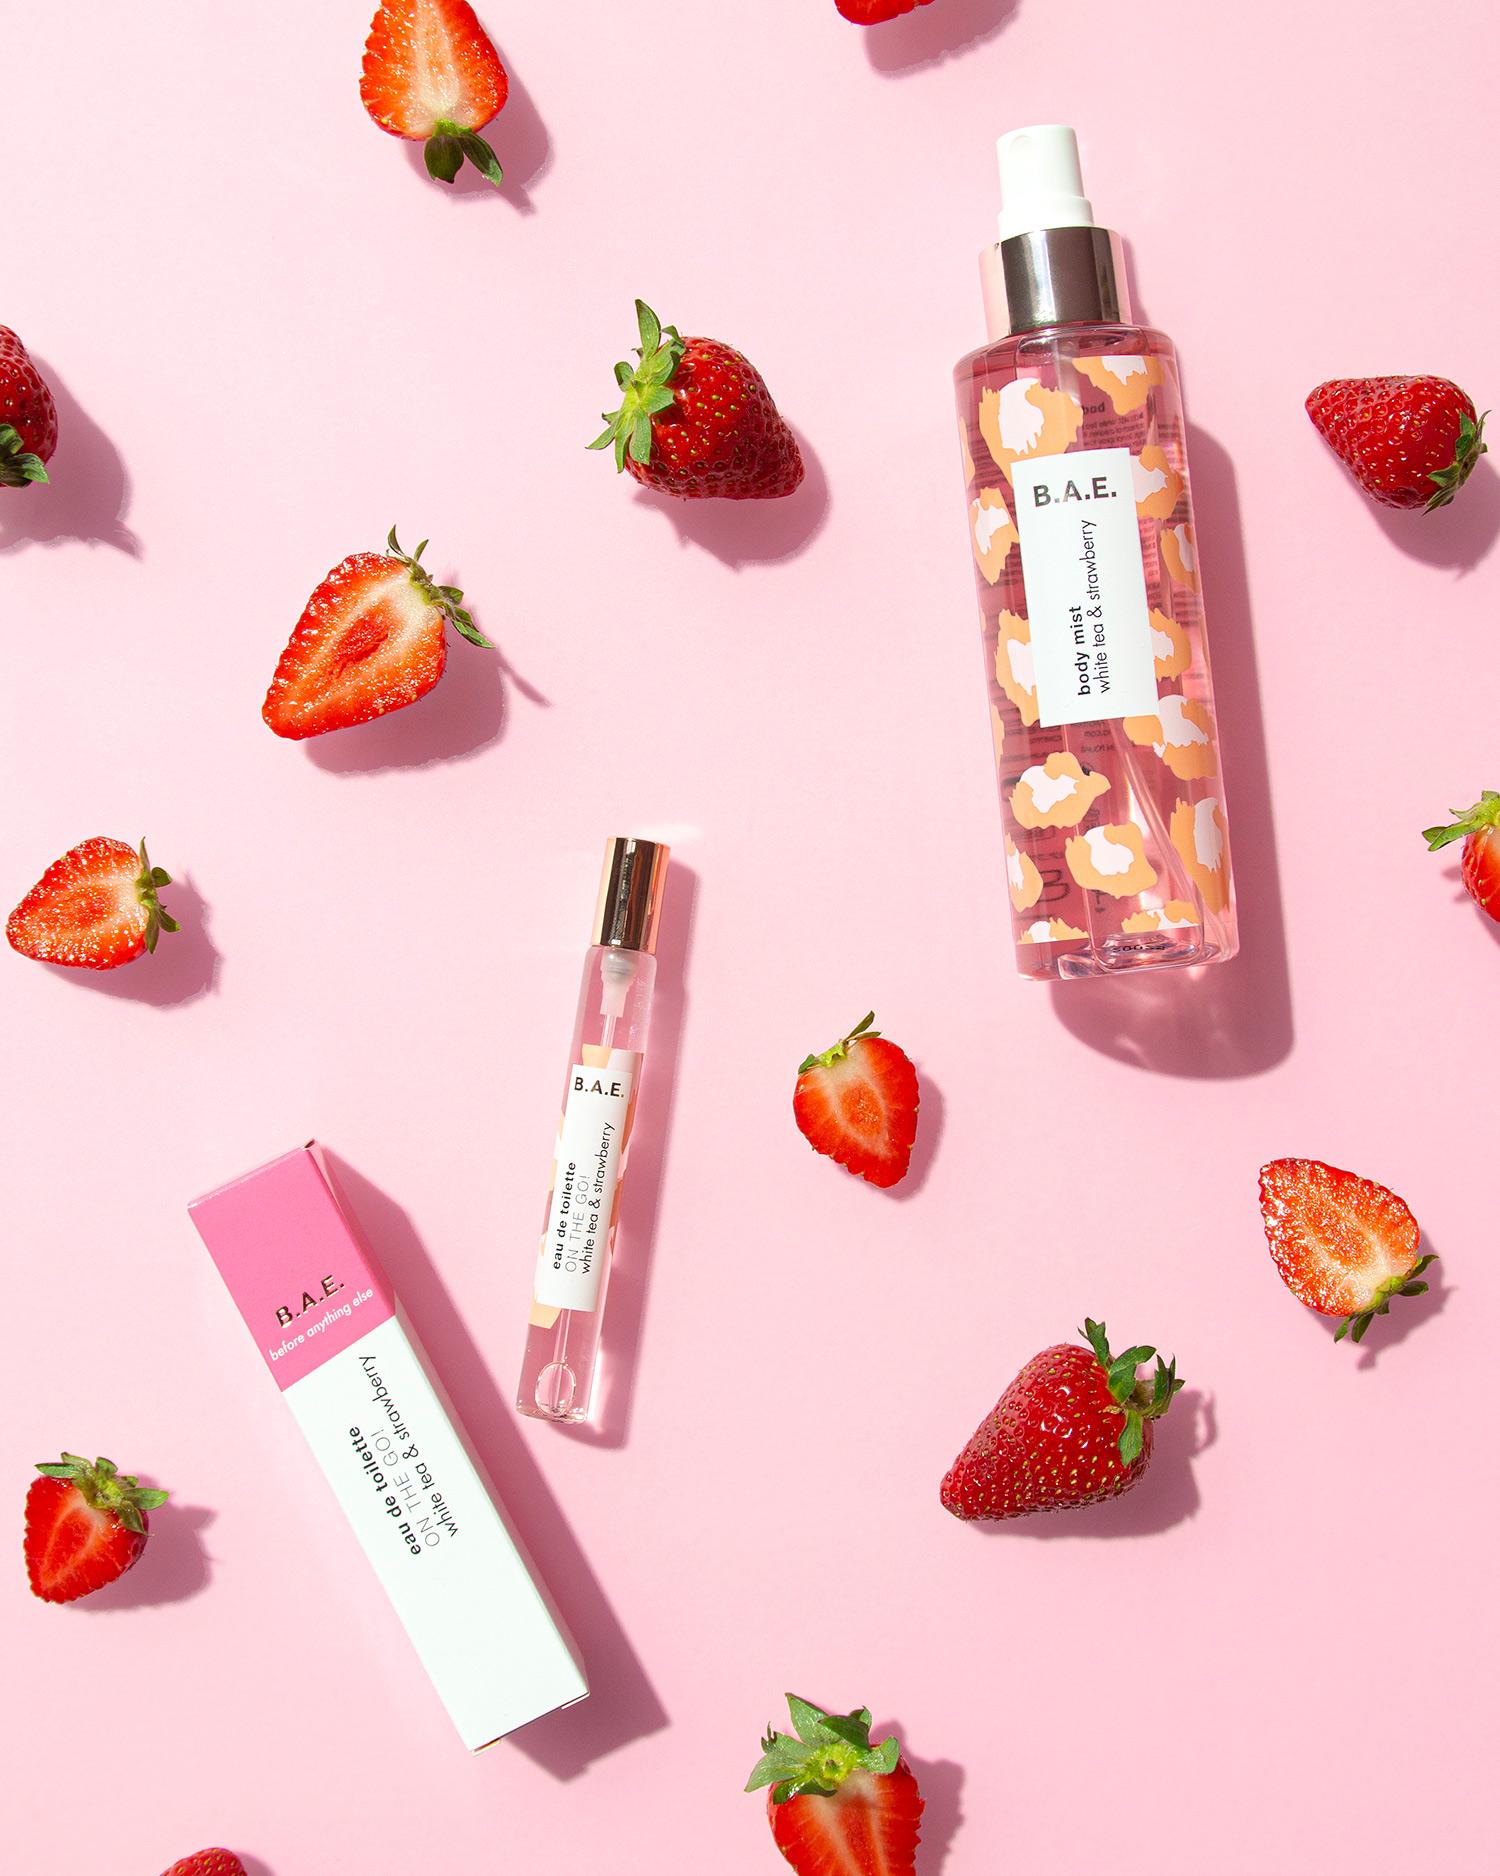 StrawberryWhiteTeaGeurlijn_BAEbyHEMA_Instagram_4-5